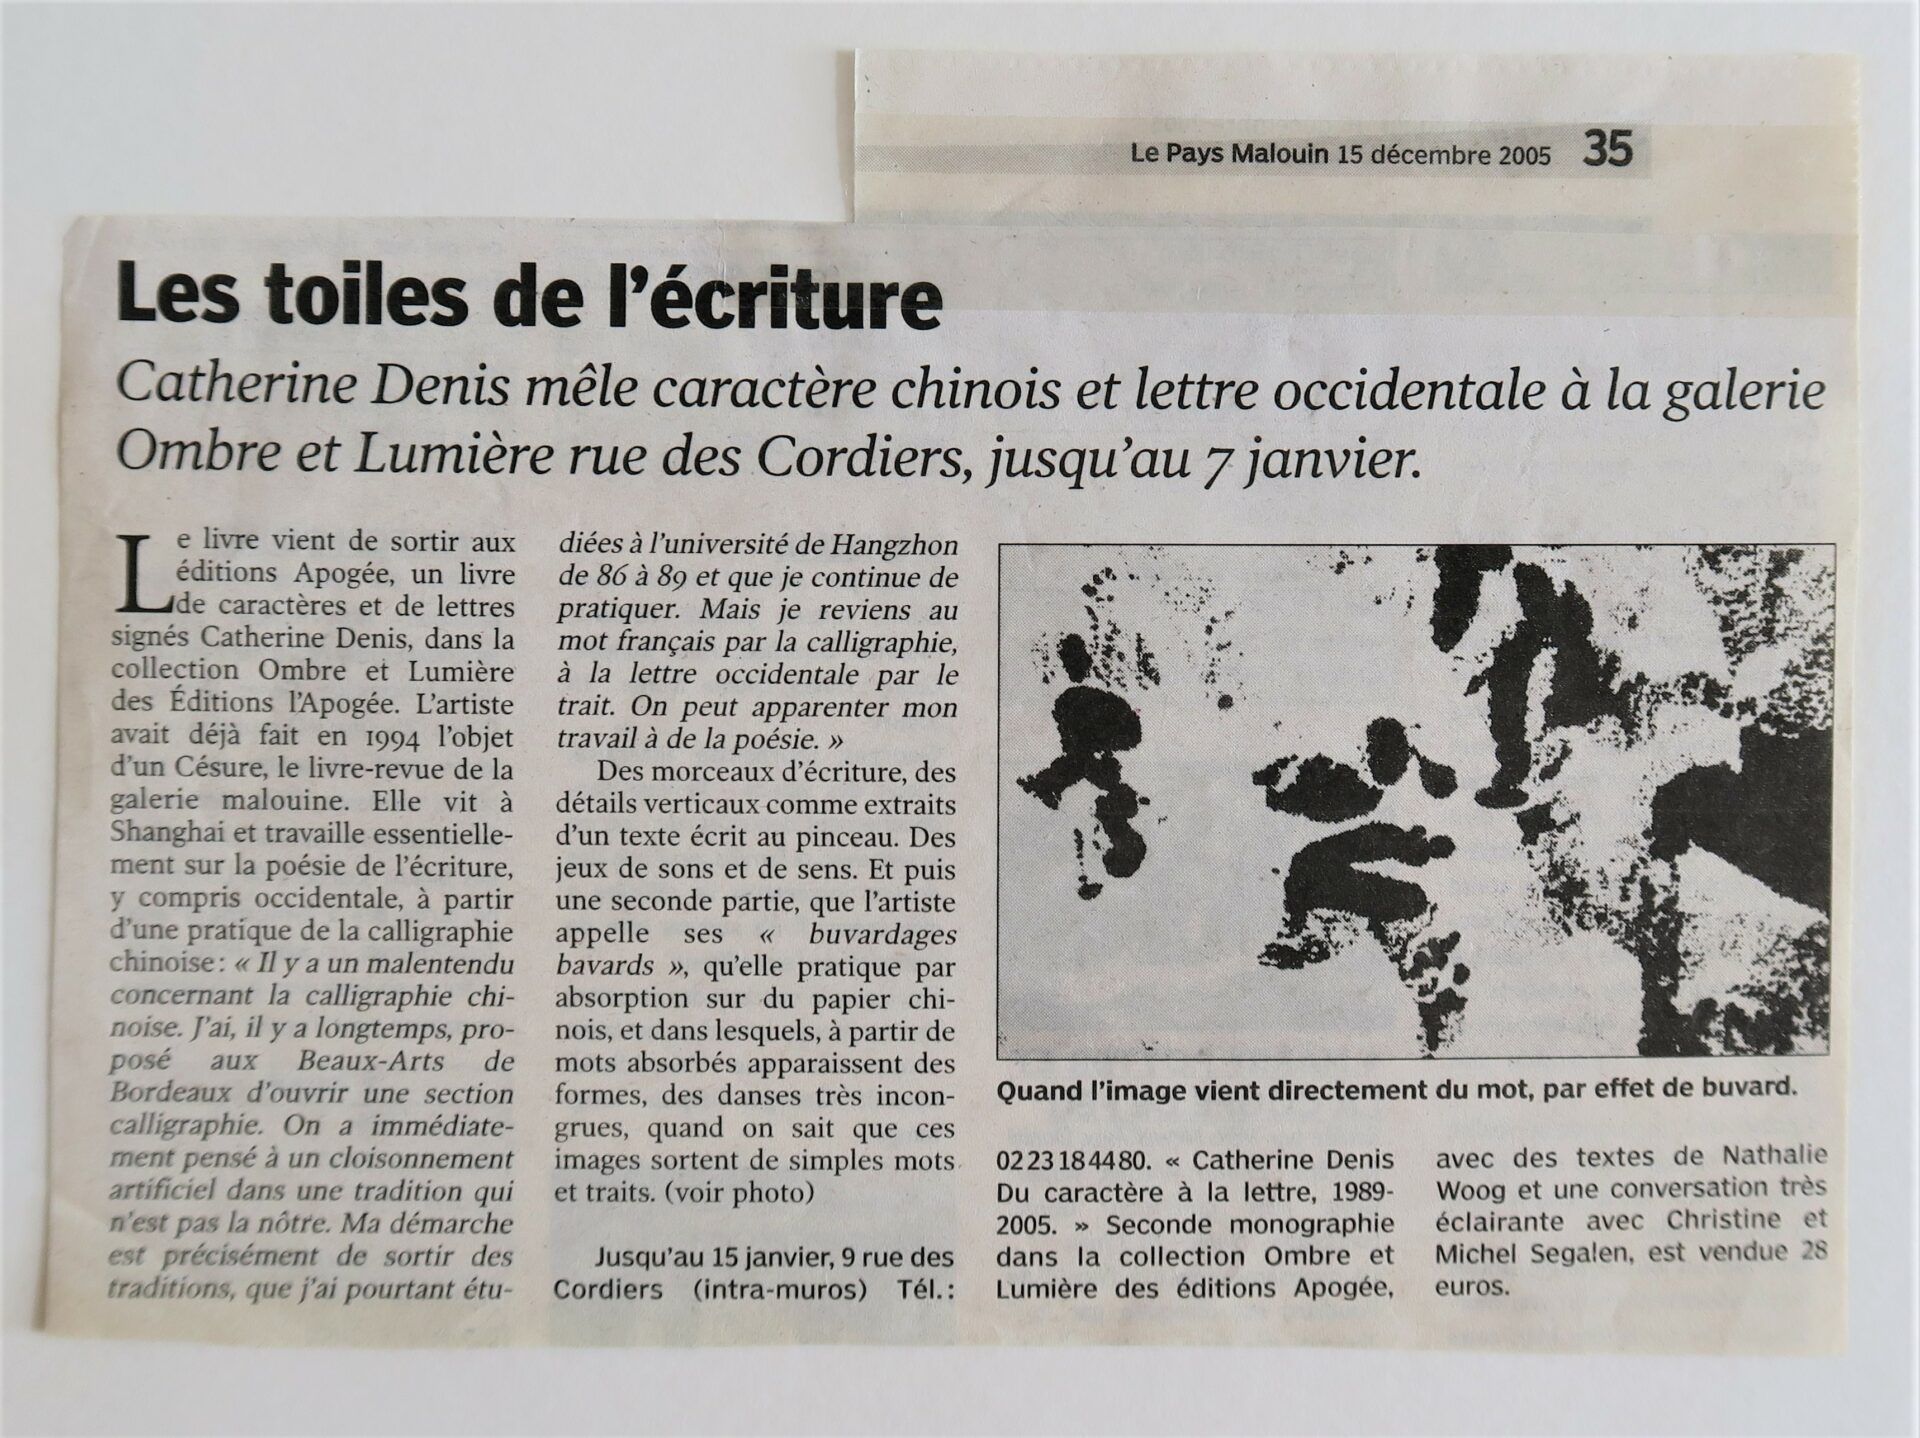 2005 - Le Pays Malouin